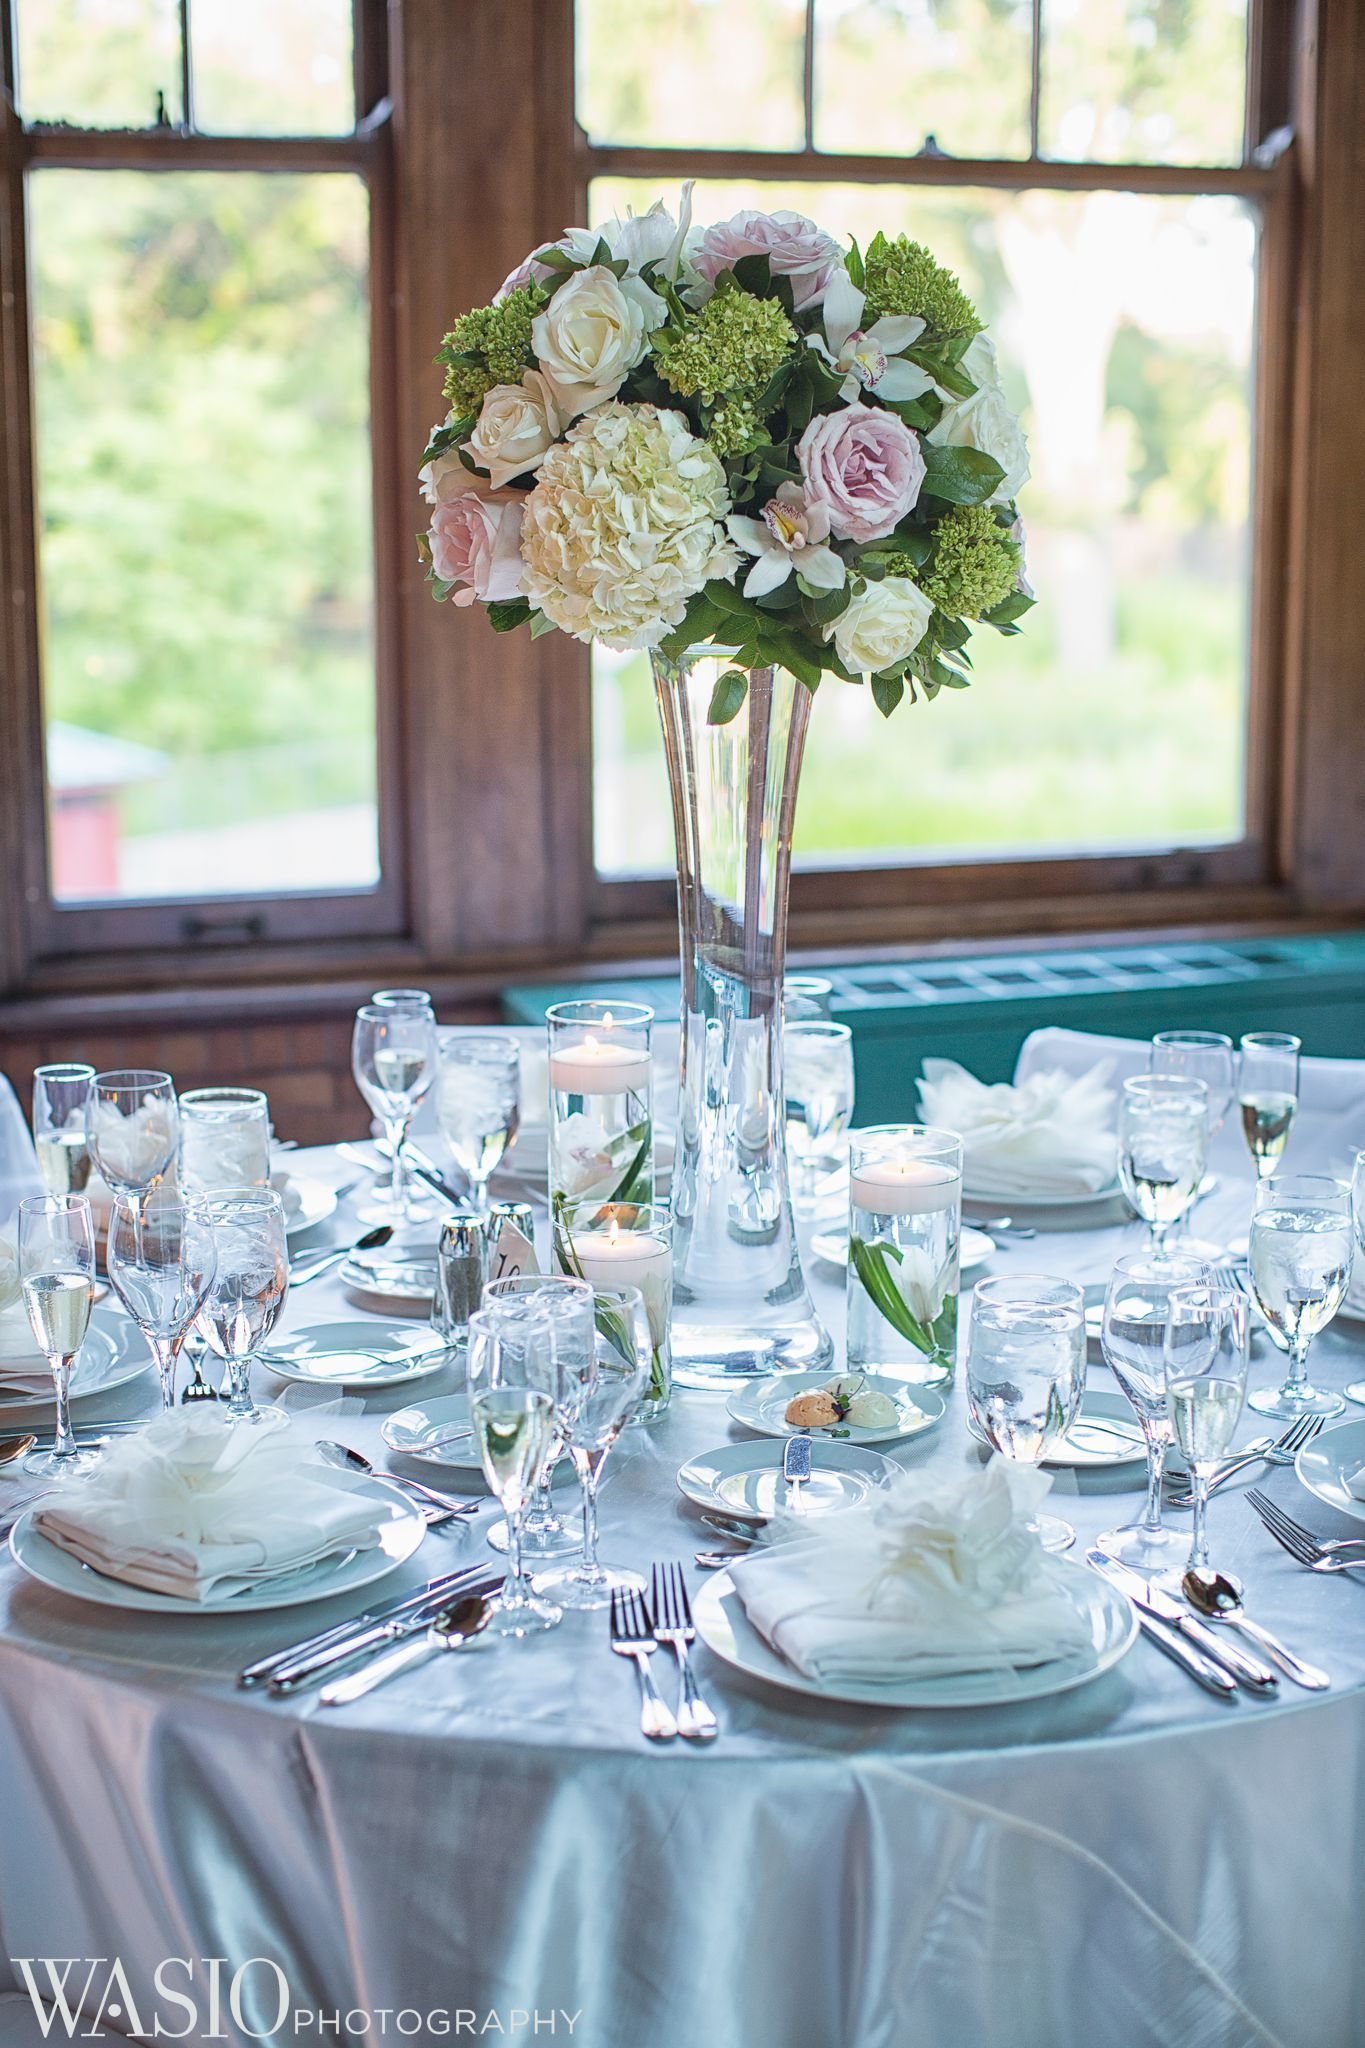 Cafe Brauer wedding venue, Lincoln Park, Chicago, table decor, fresh floral flowers